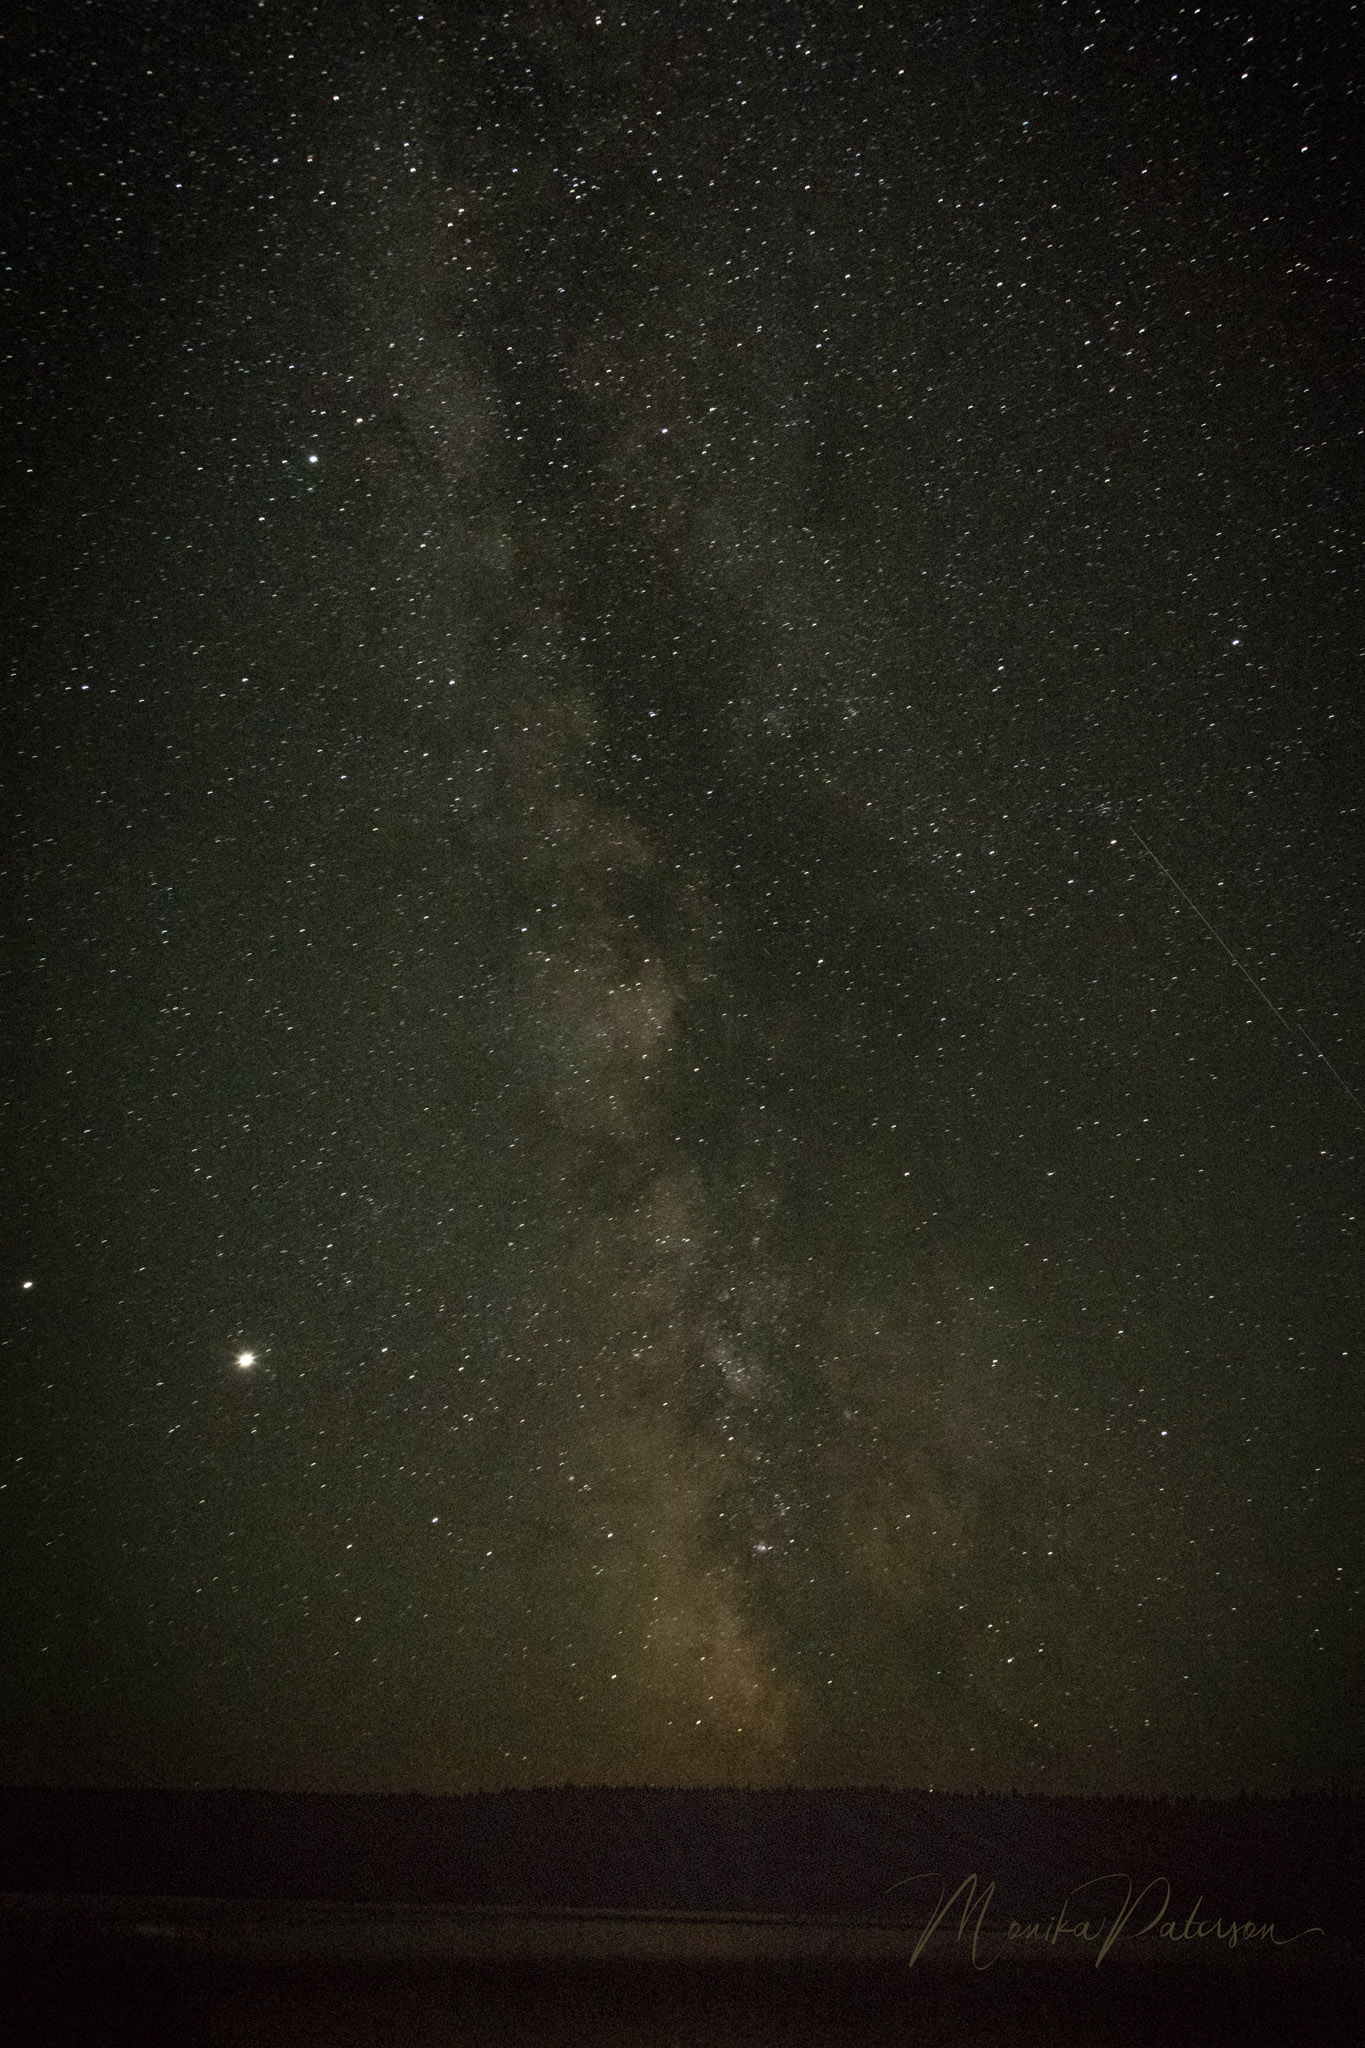 Milky Way Vertical - Monika Paterson